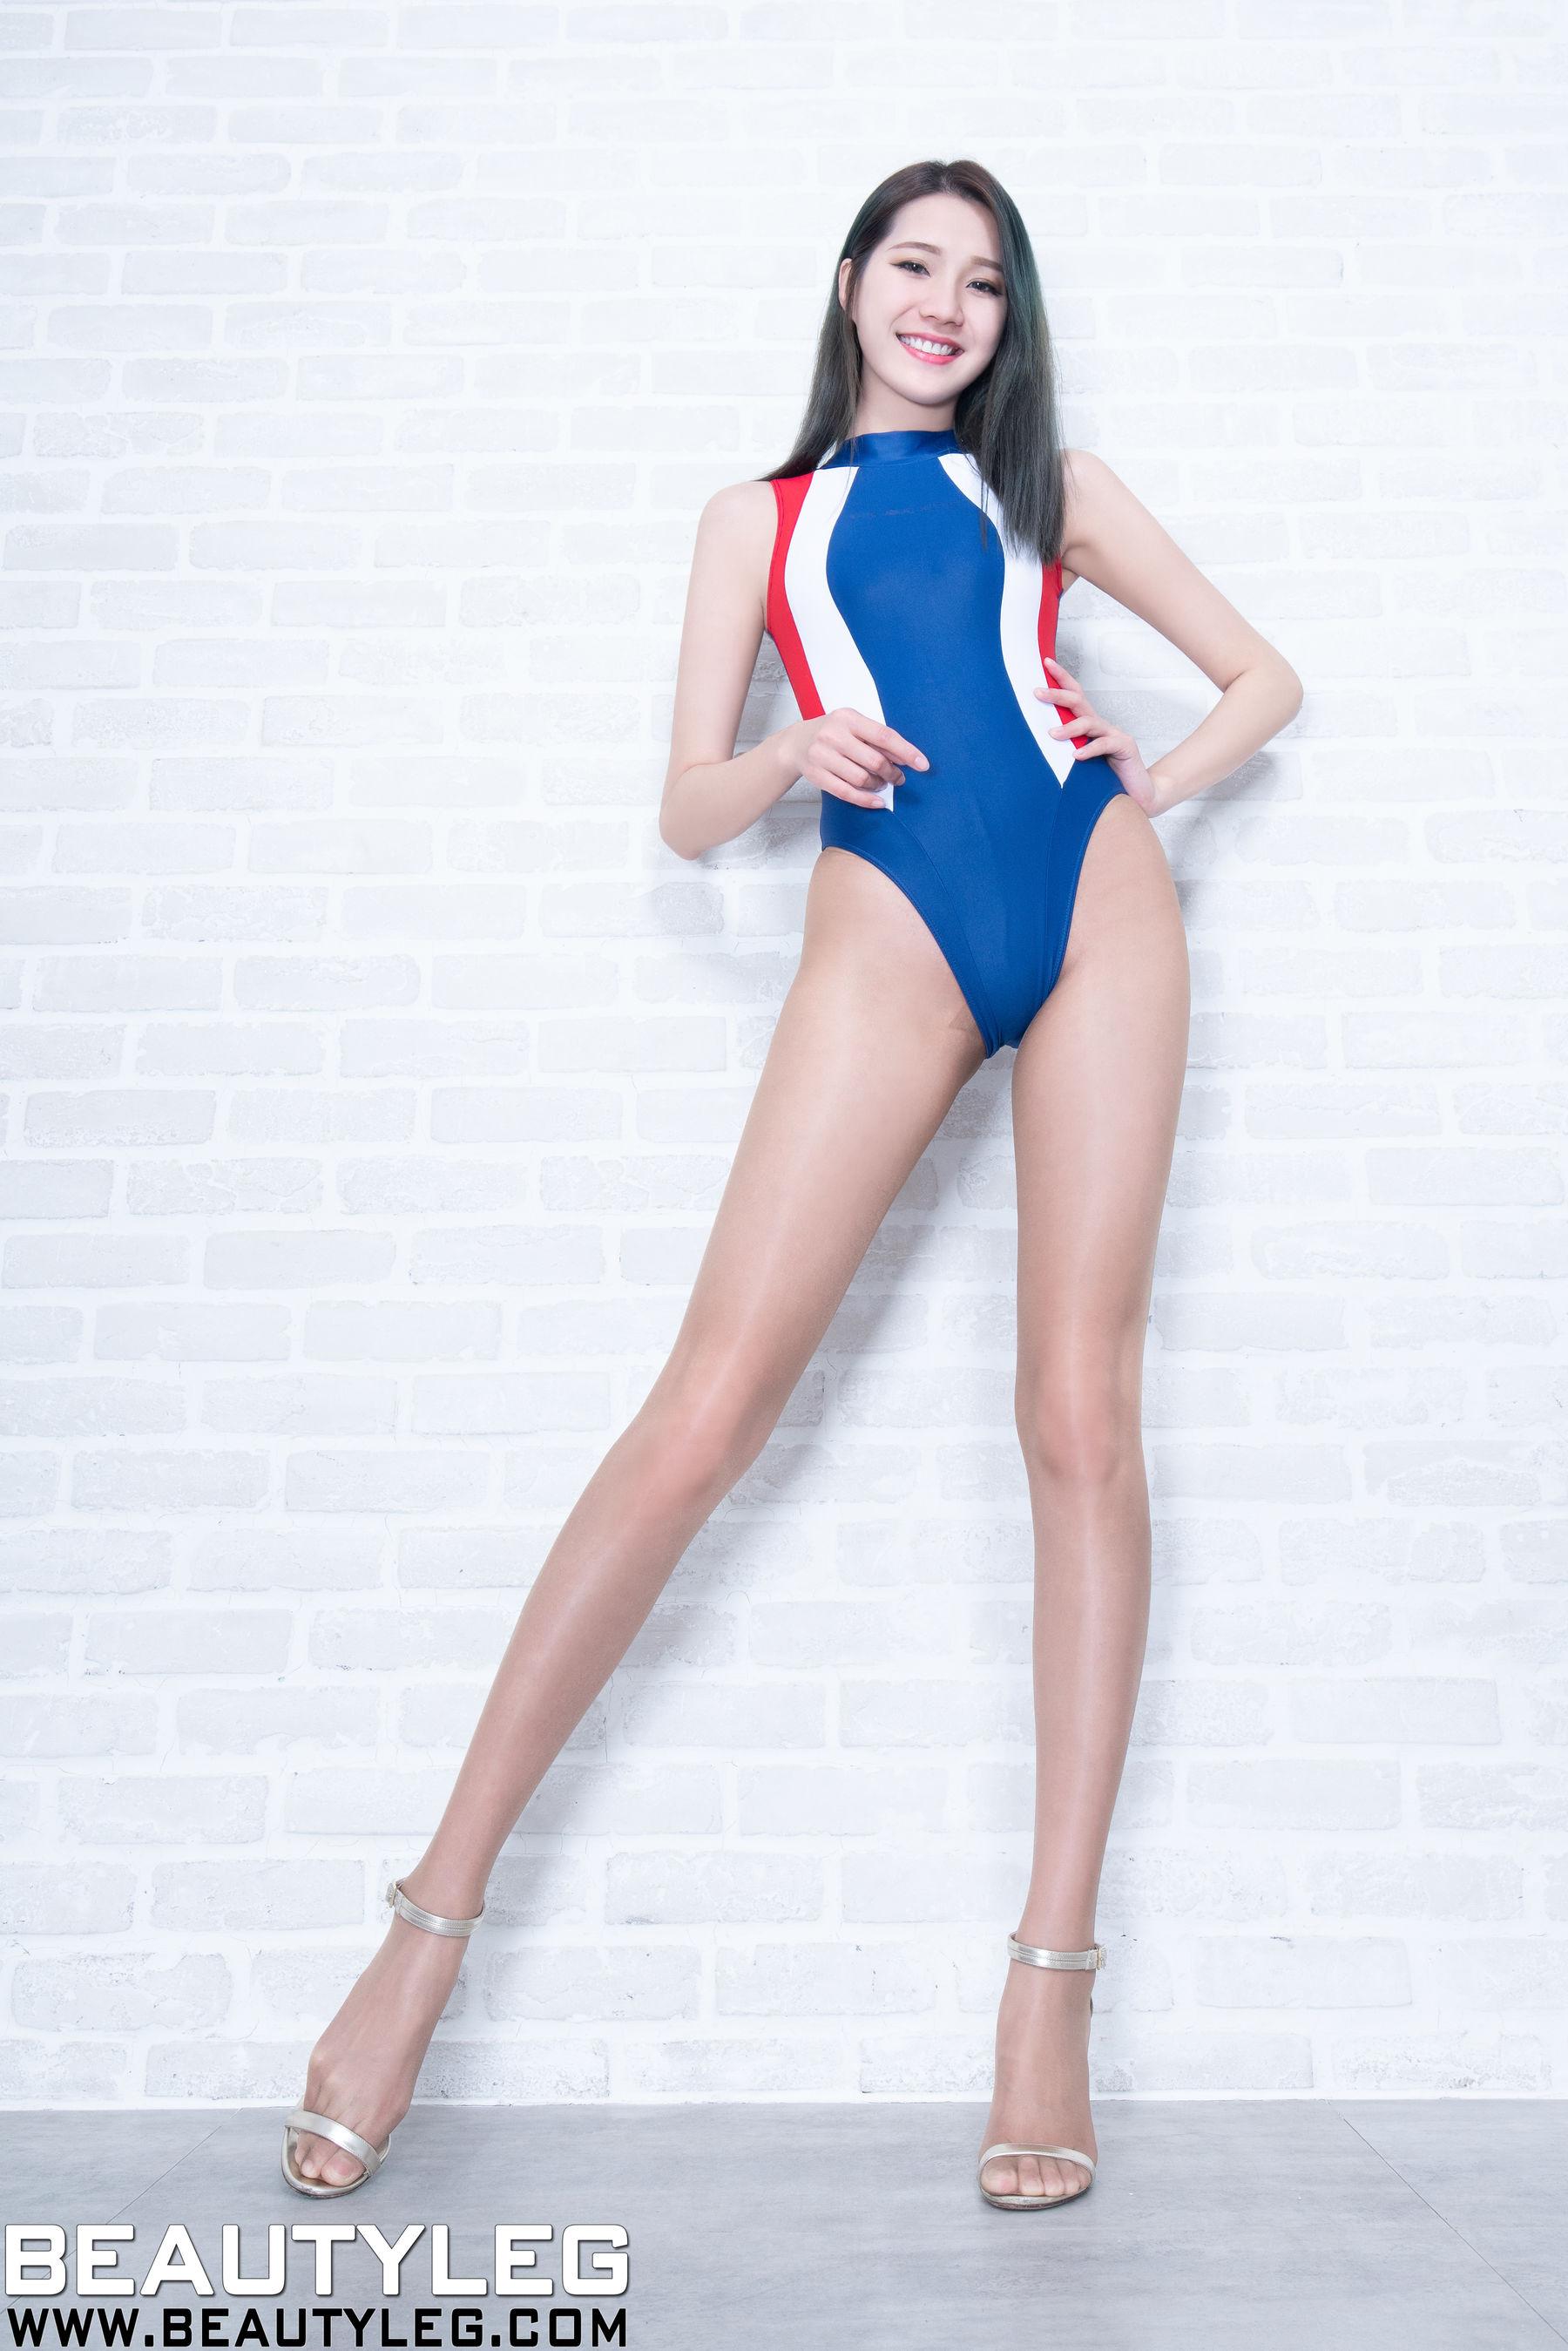 VOL.912 [Beautyleg]高叉泳装丝袜美腿肉丝袜:林千如(腿模Anita)超高清个人性感漂亮大图(64P)